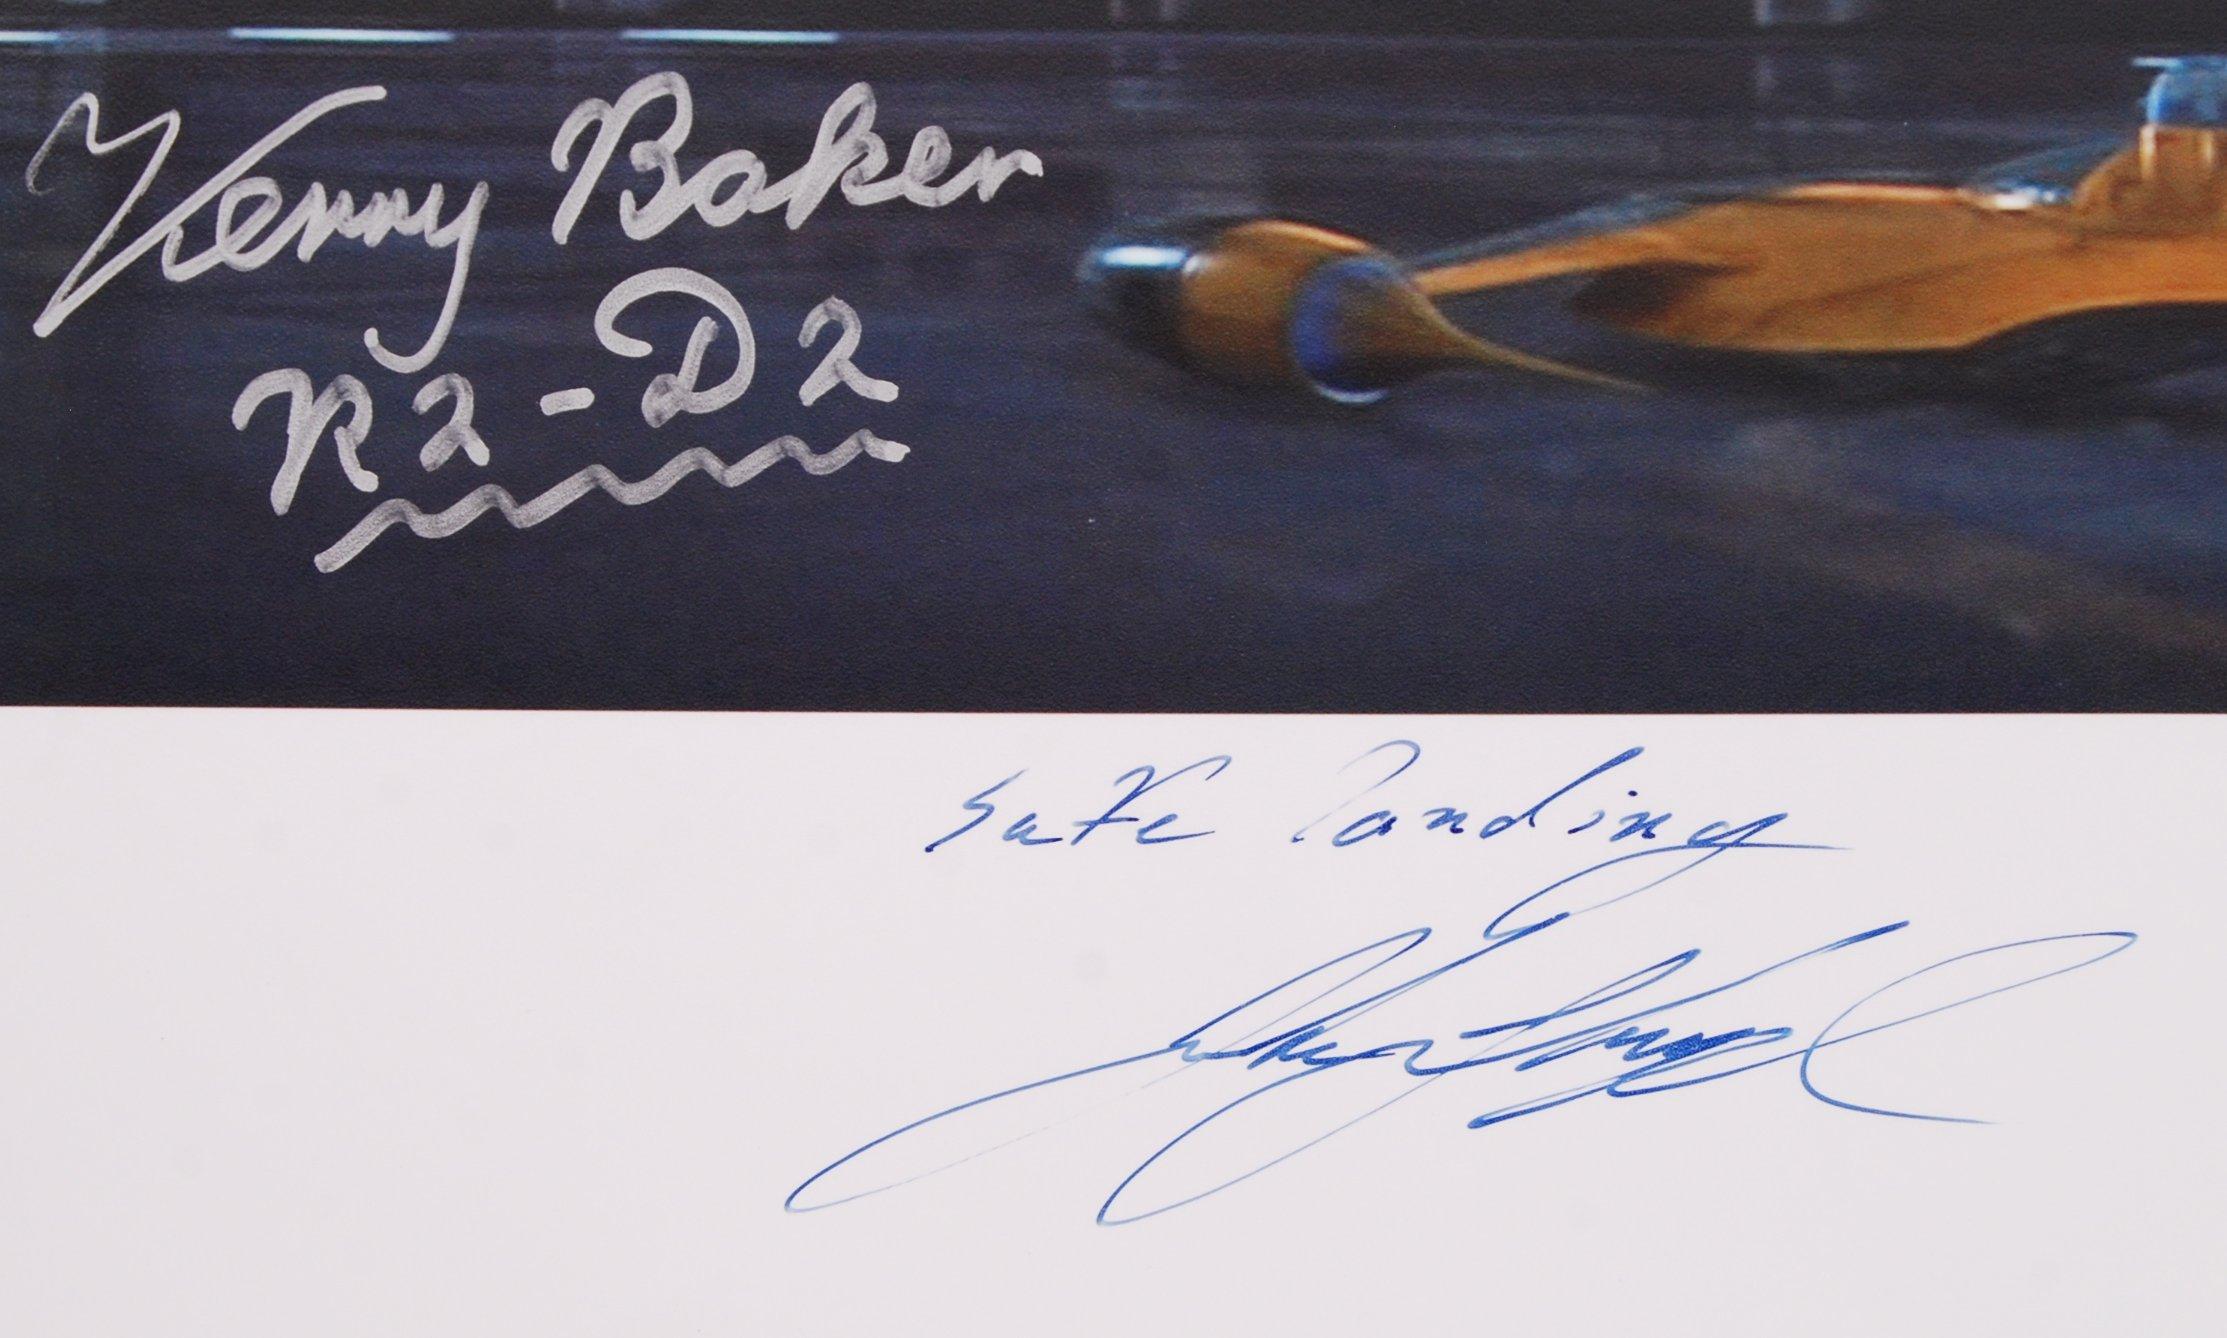 STAR WARS - JAKE LLOYD & KENNY BAKER - AUTOGRAPHED - Image 2 of 3